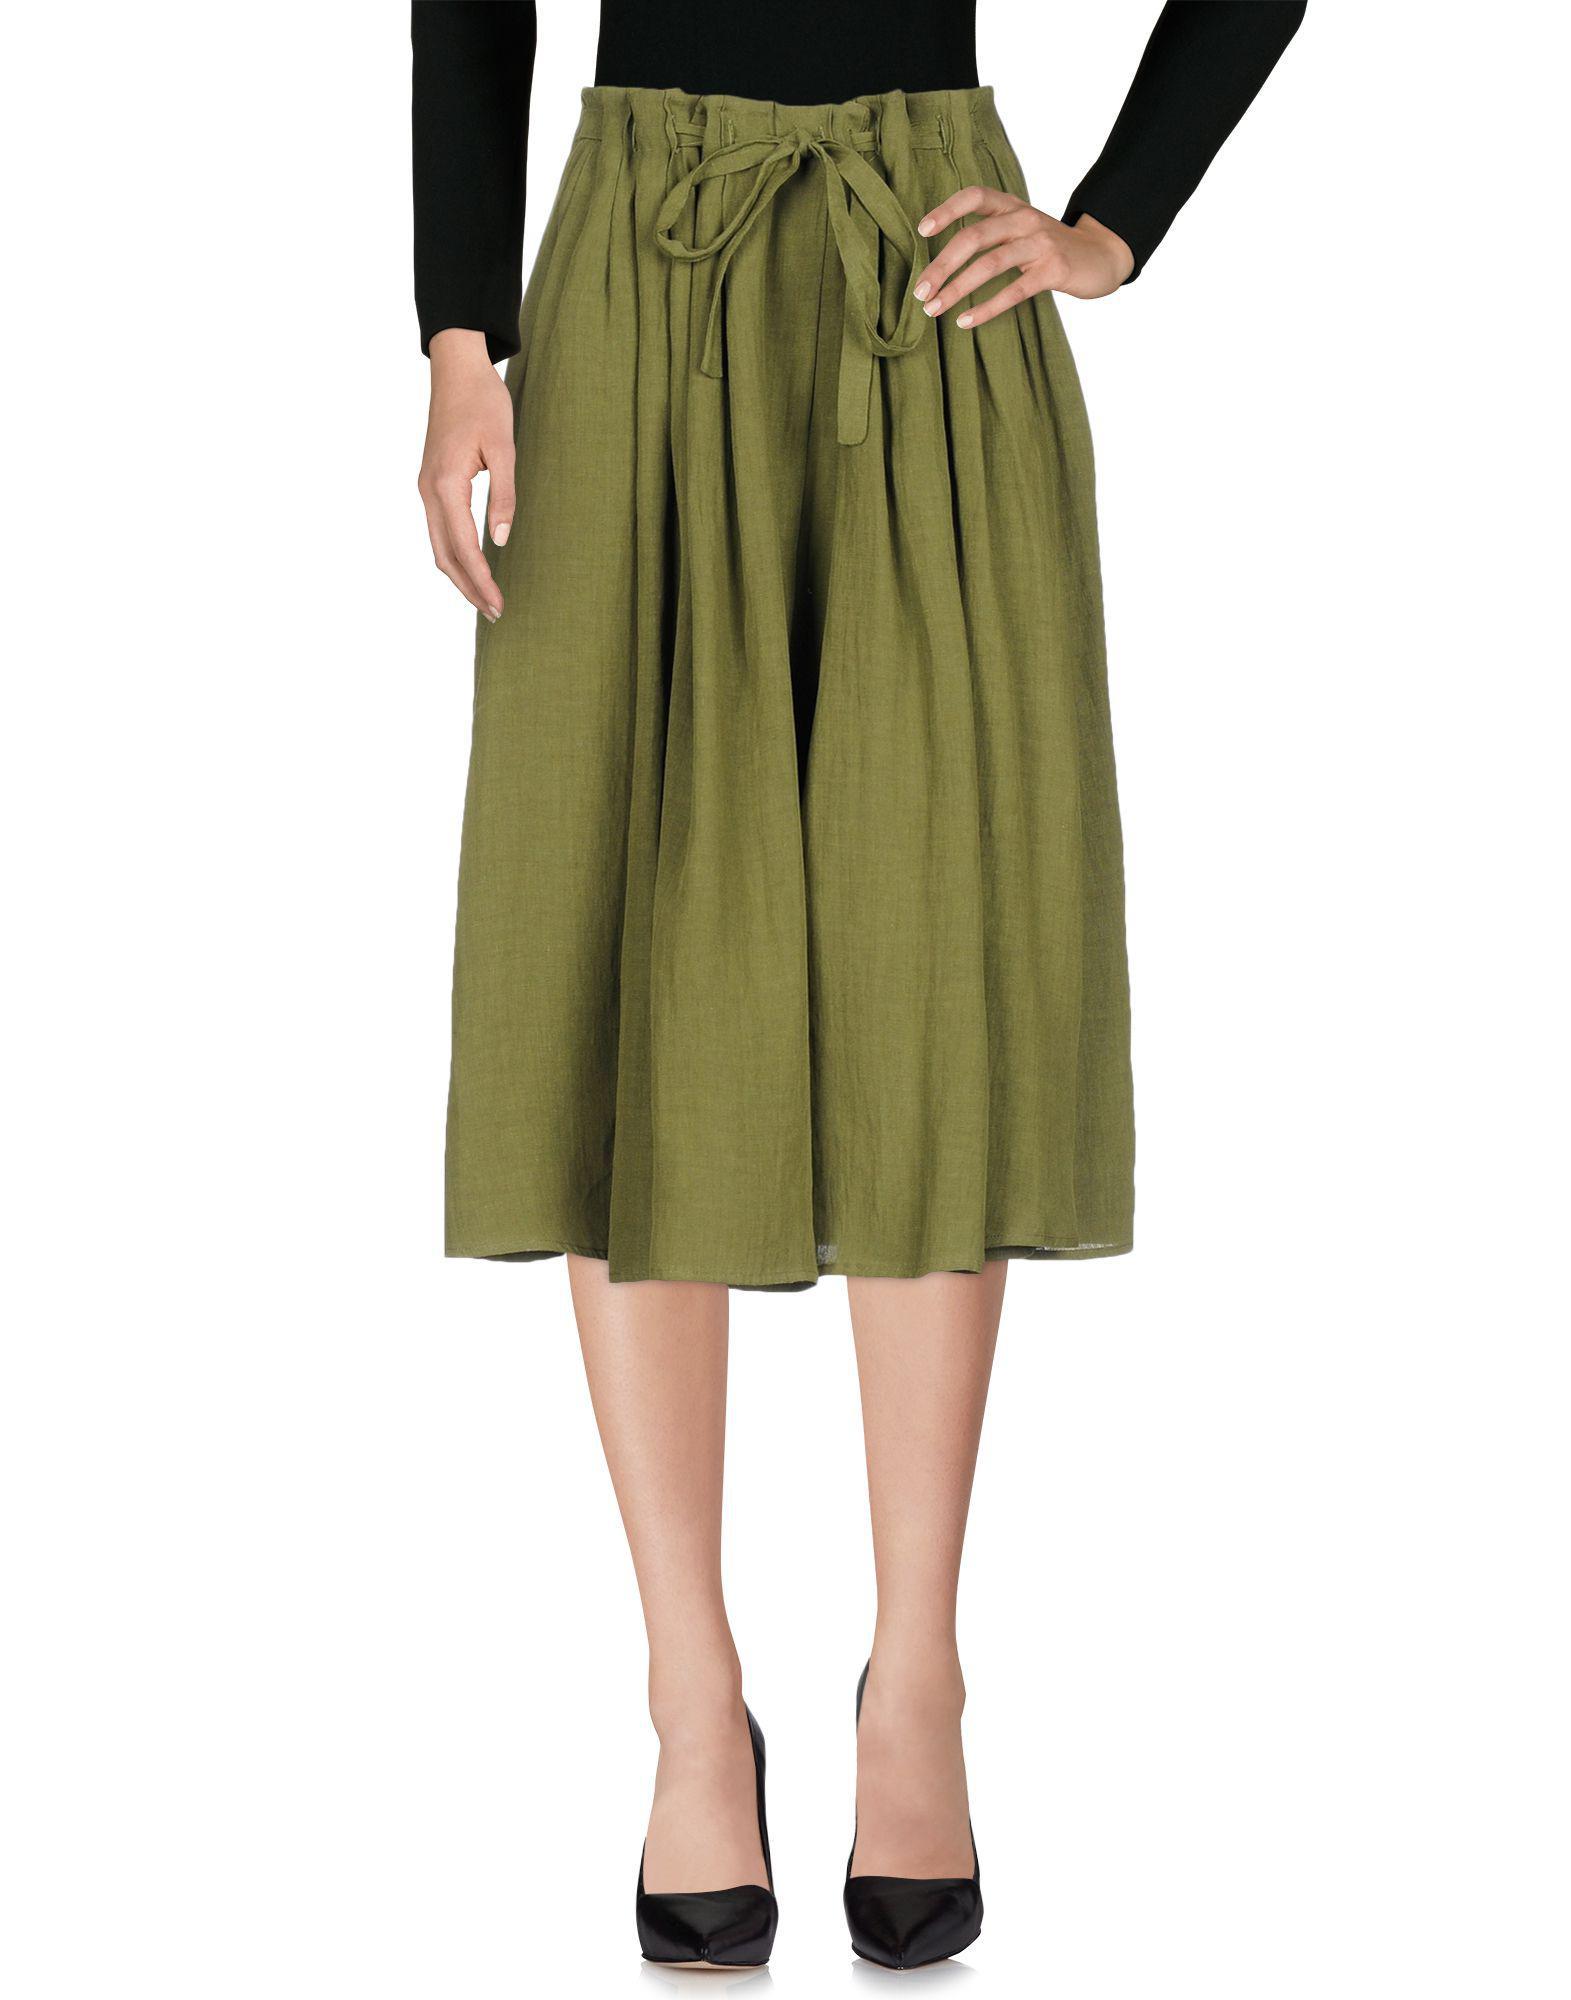 SKIRTS - 3/4 length skirts Apuntob TVCbFPM